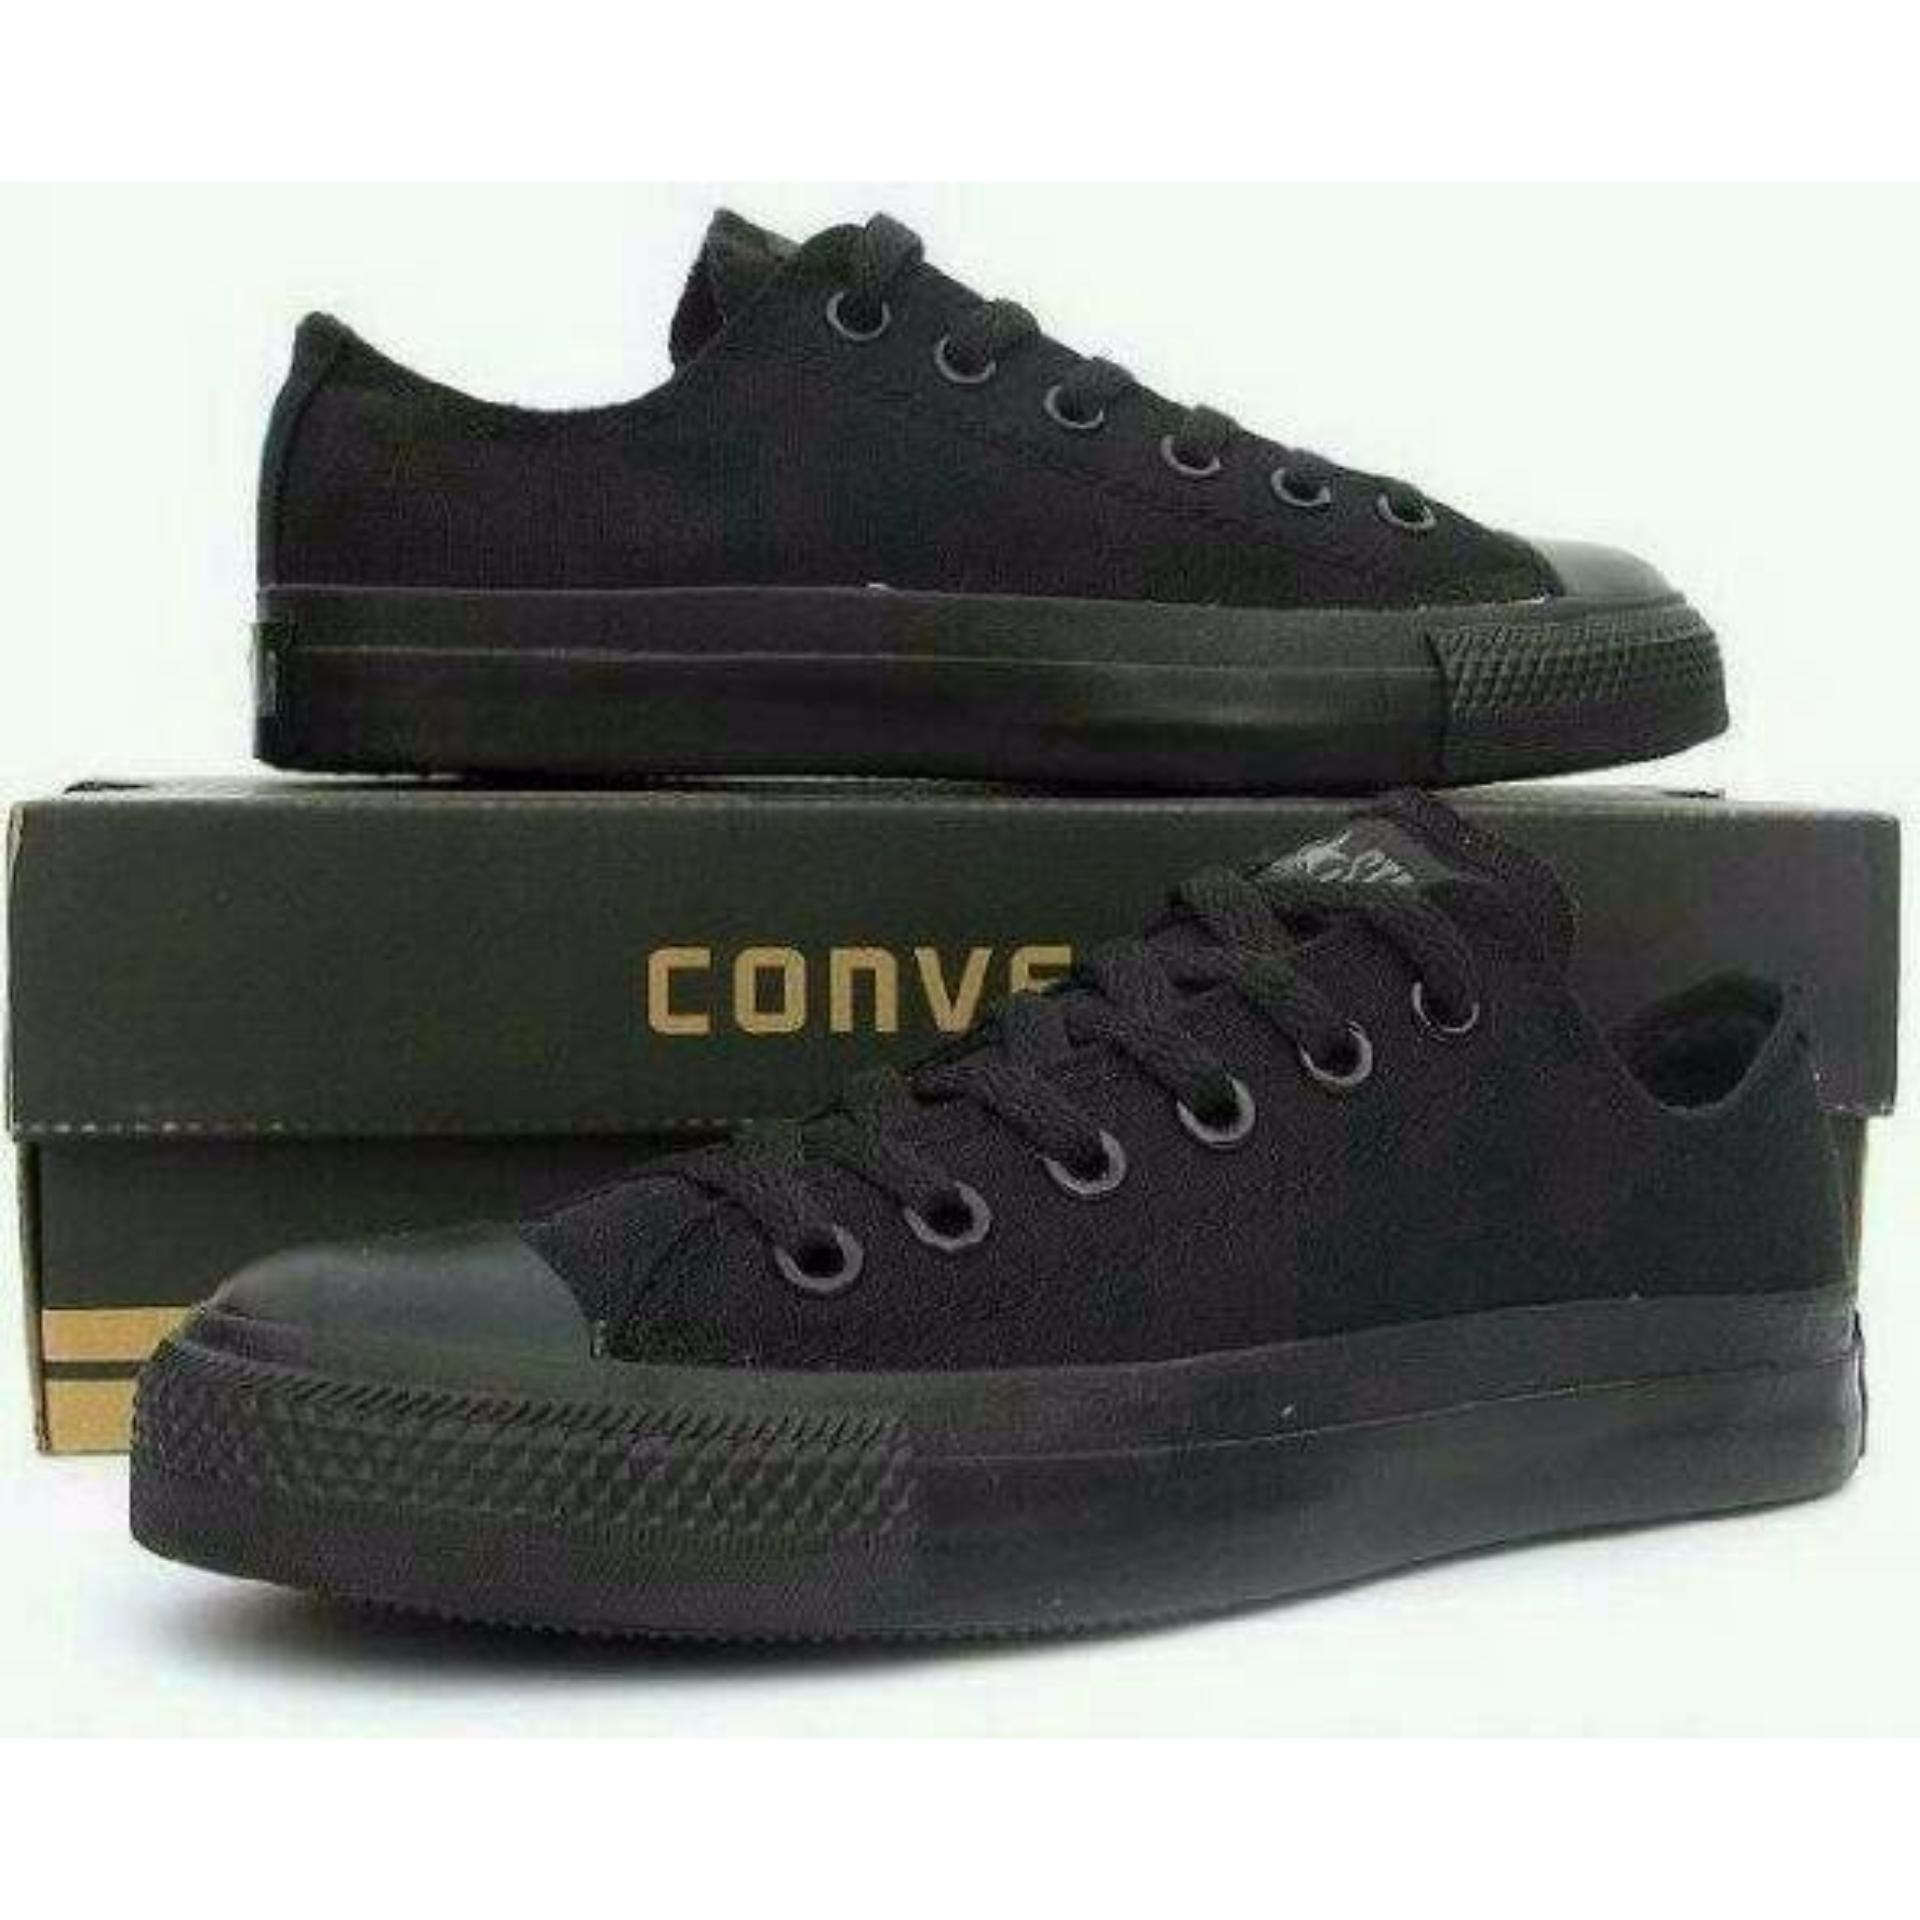 Sepatu Casual Harian Sekolah Kuliah Converse Allstar CT Mono Full Black Hitam Low Pria Wanita Couple